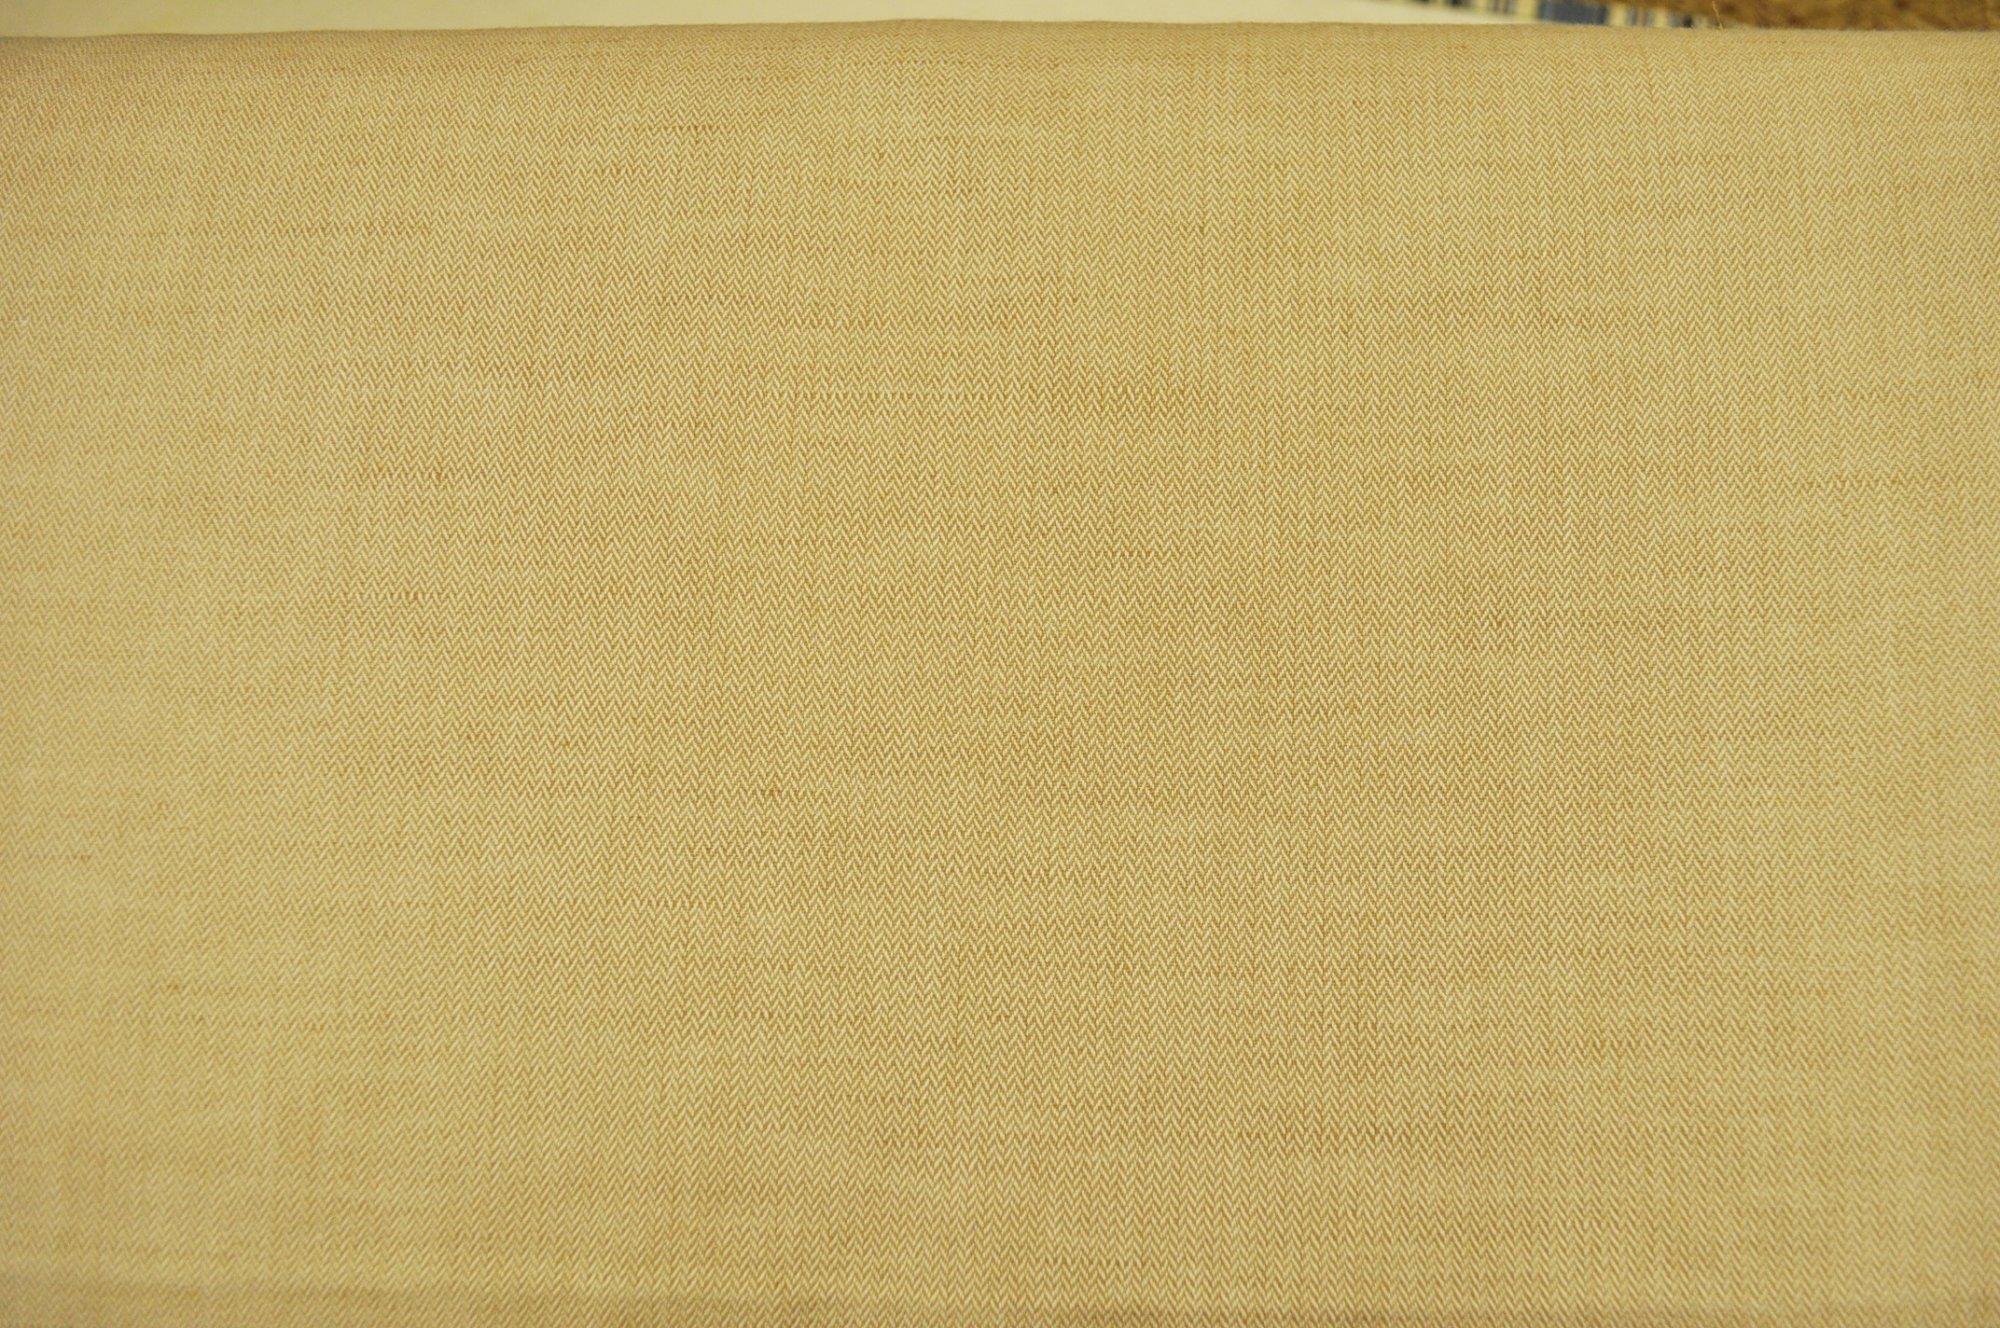 Bradford Herringbone Linen/Cotton Tan